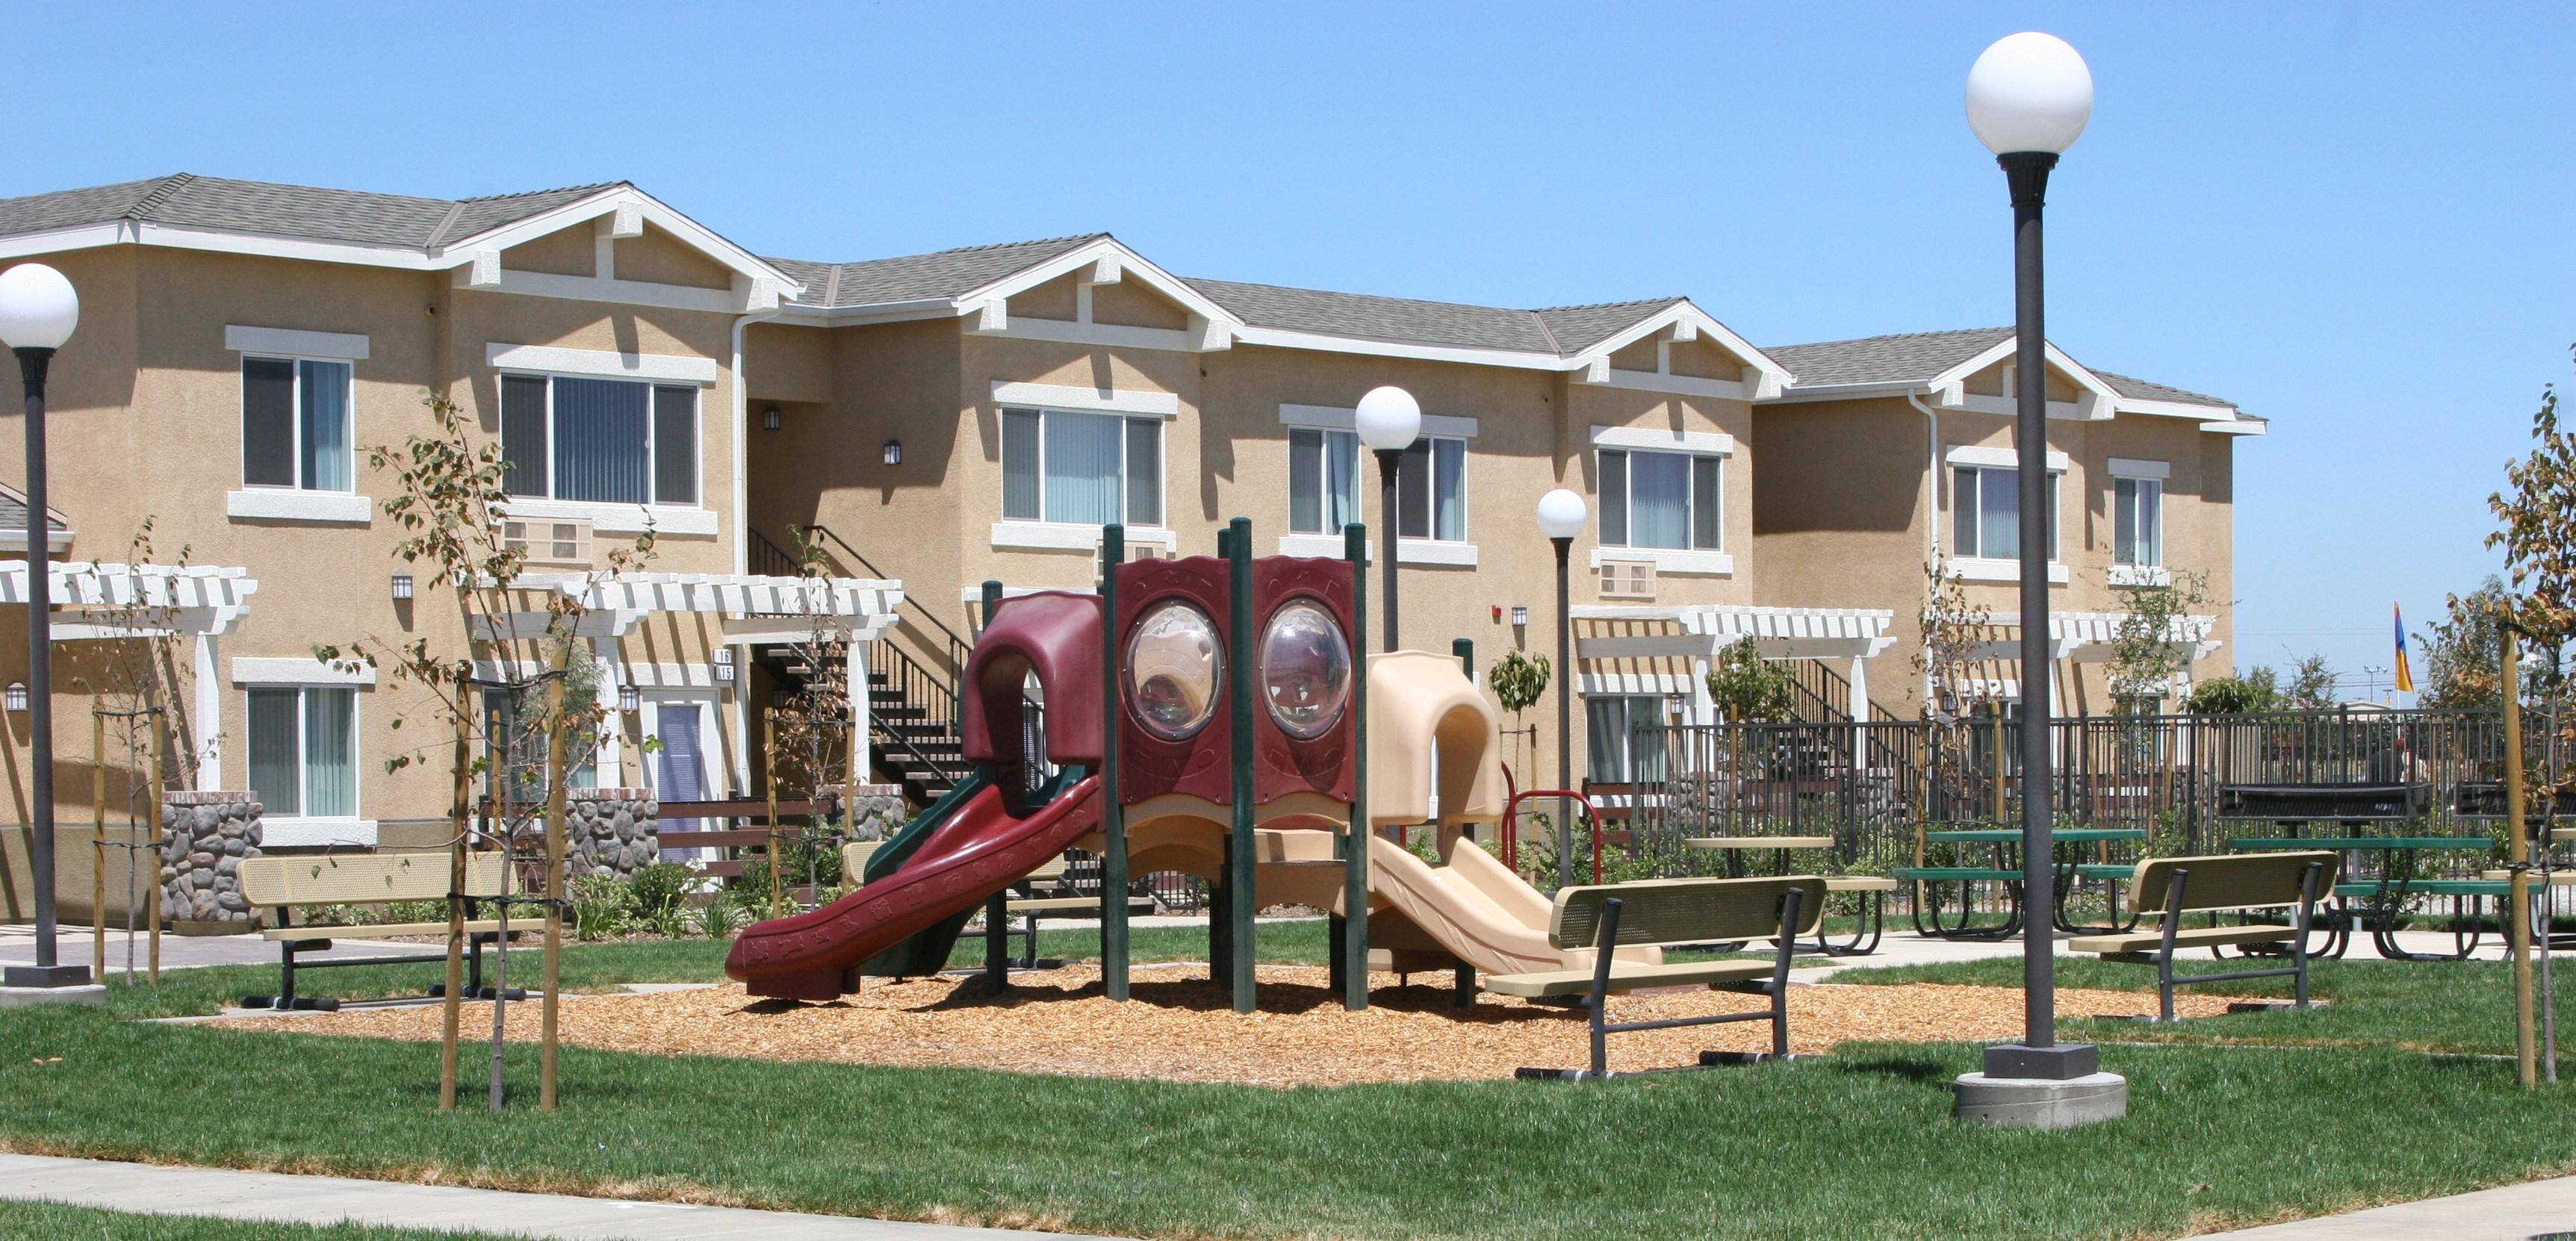 Pacheco Village, 2241 Gilbert Gonzalez Jr. Dr., Los Banos, CA